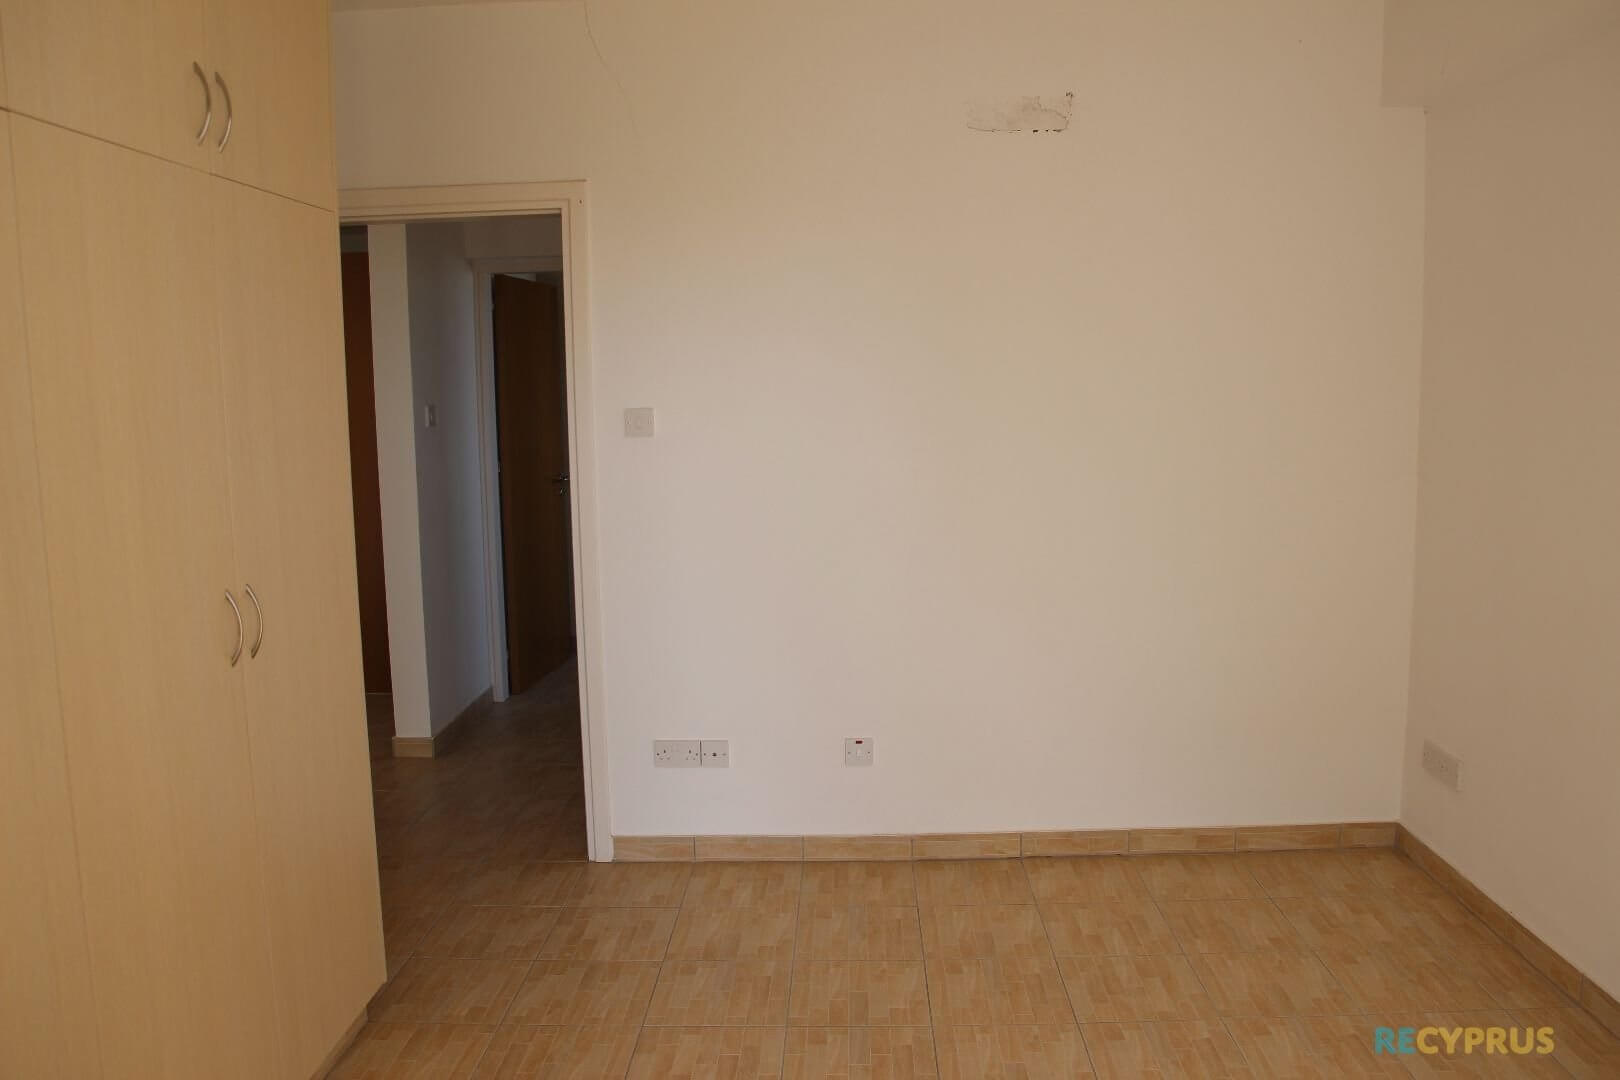 Apartment for sale Kapparis Famagusta Cyprus 7 3519